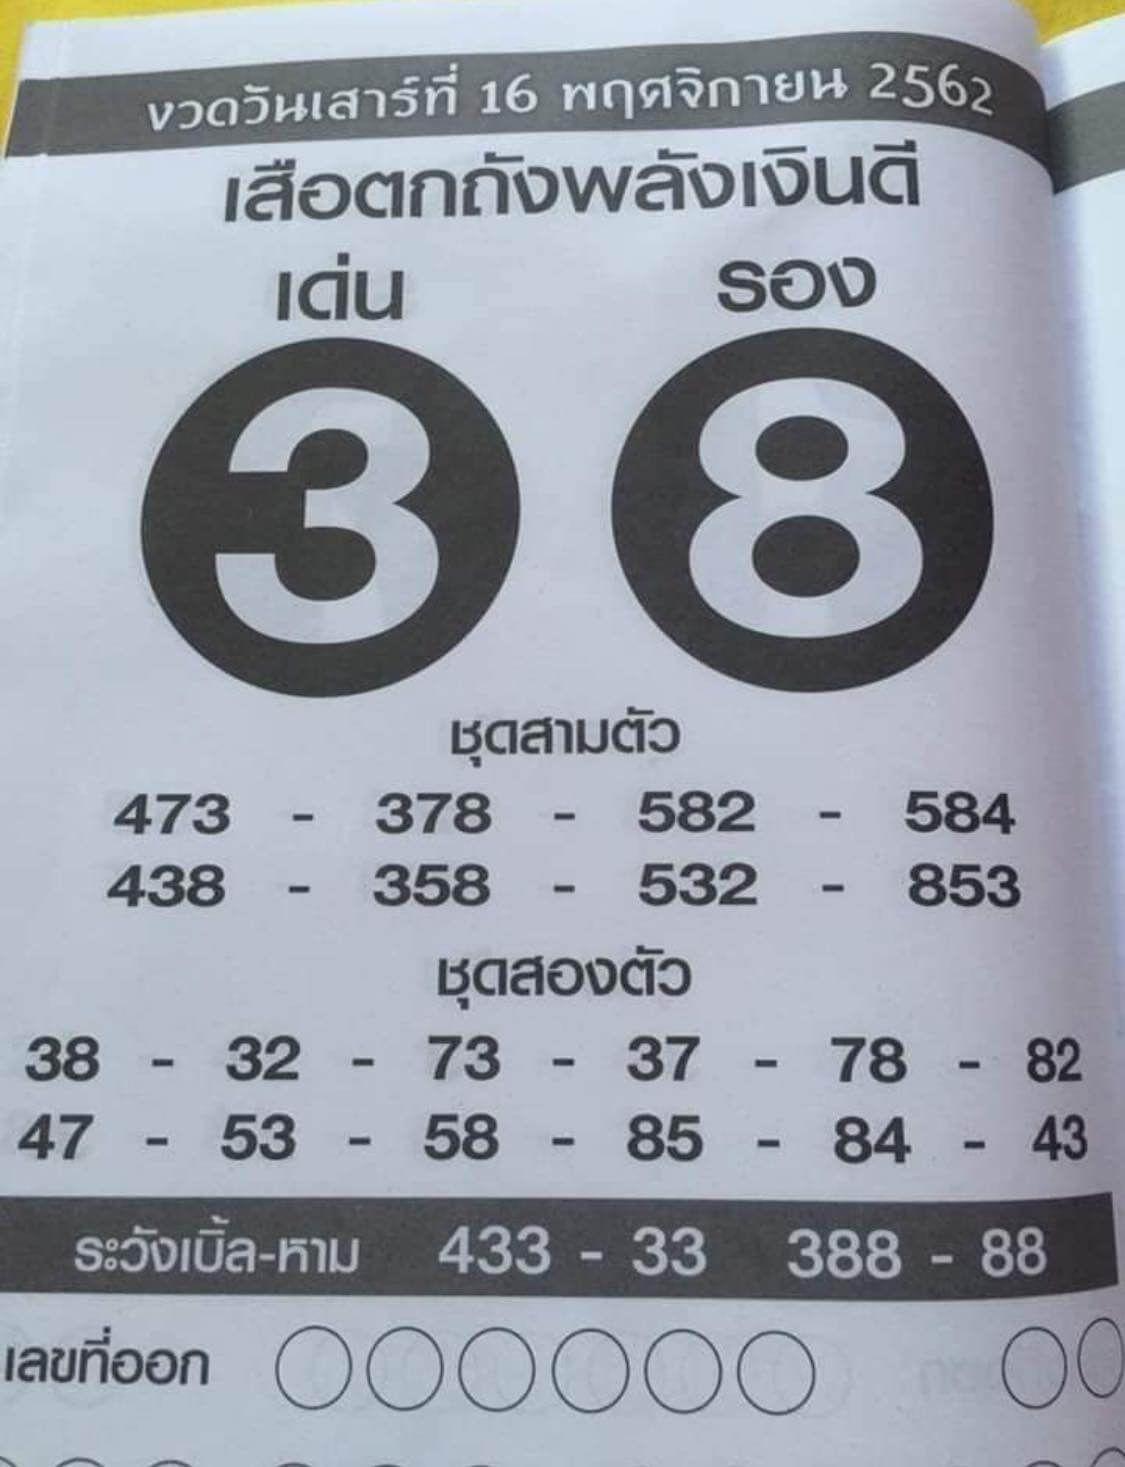 16 11 62